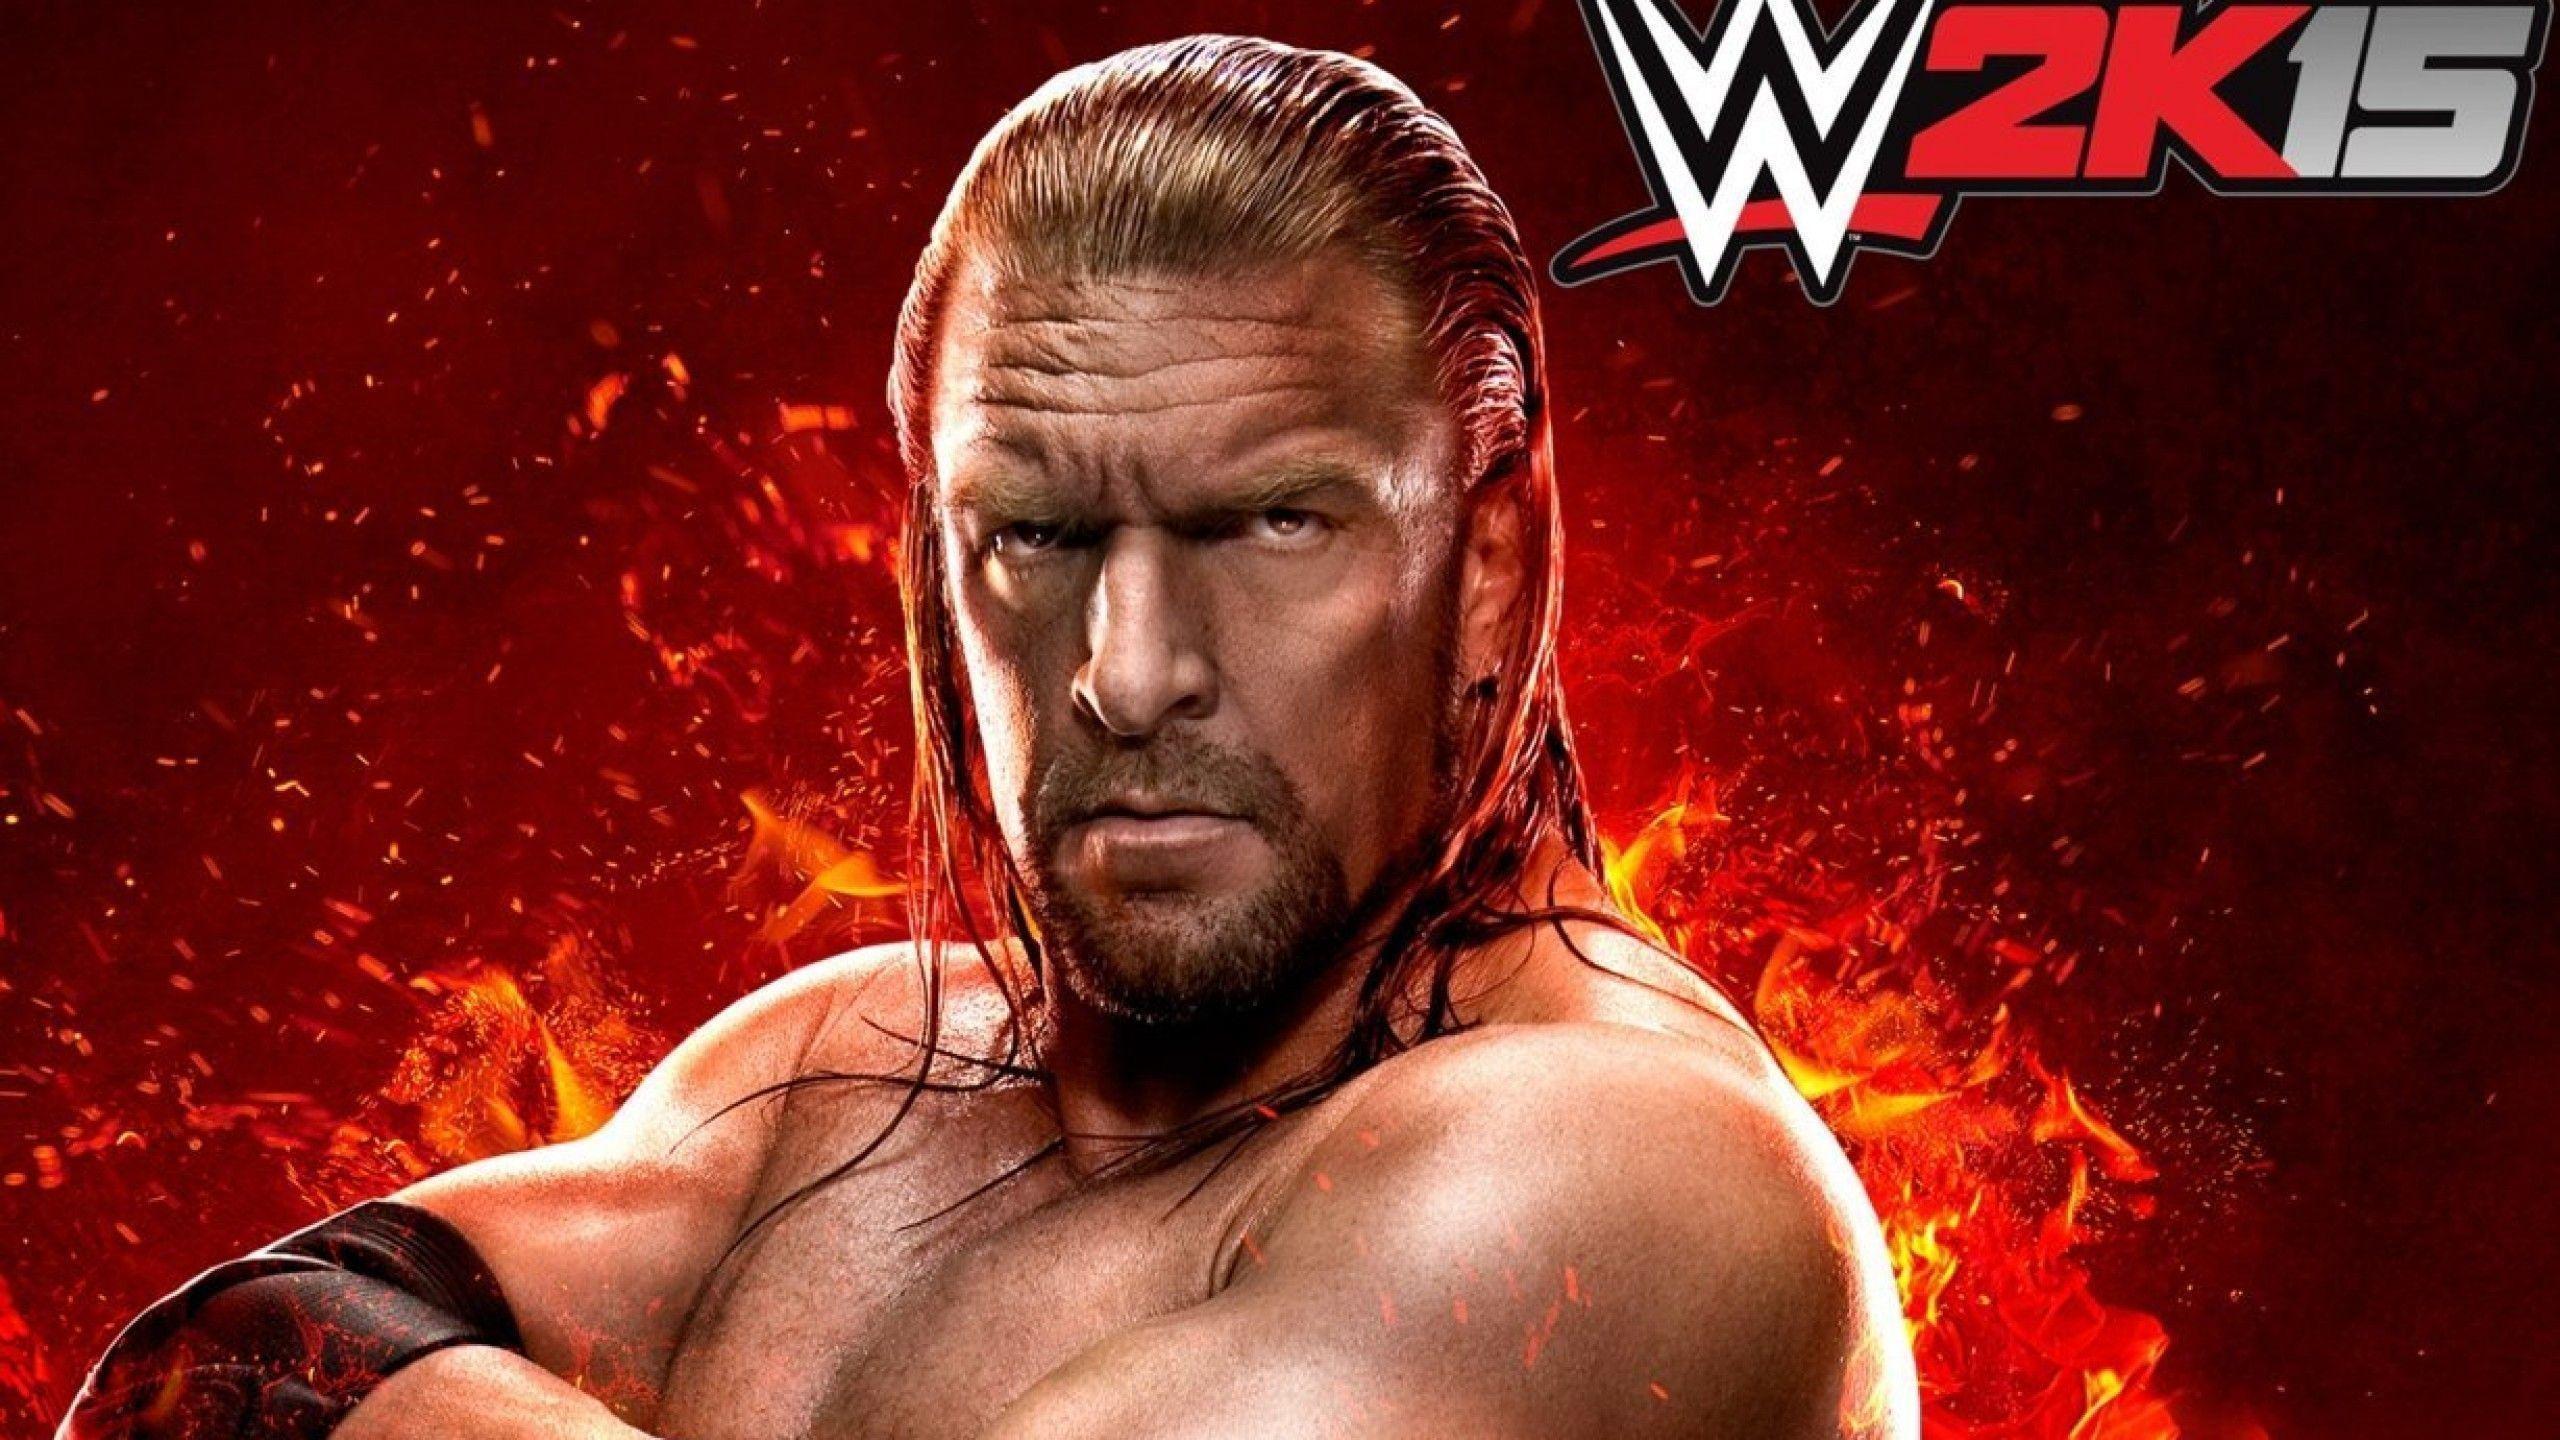 Triple H Logos Wallpaper 65 Images